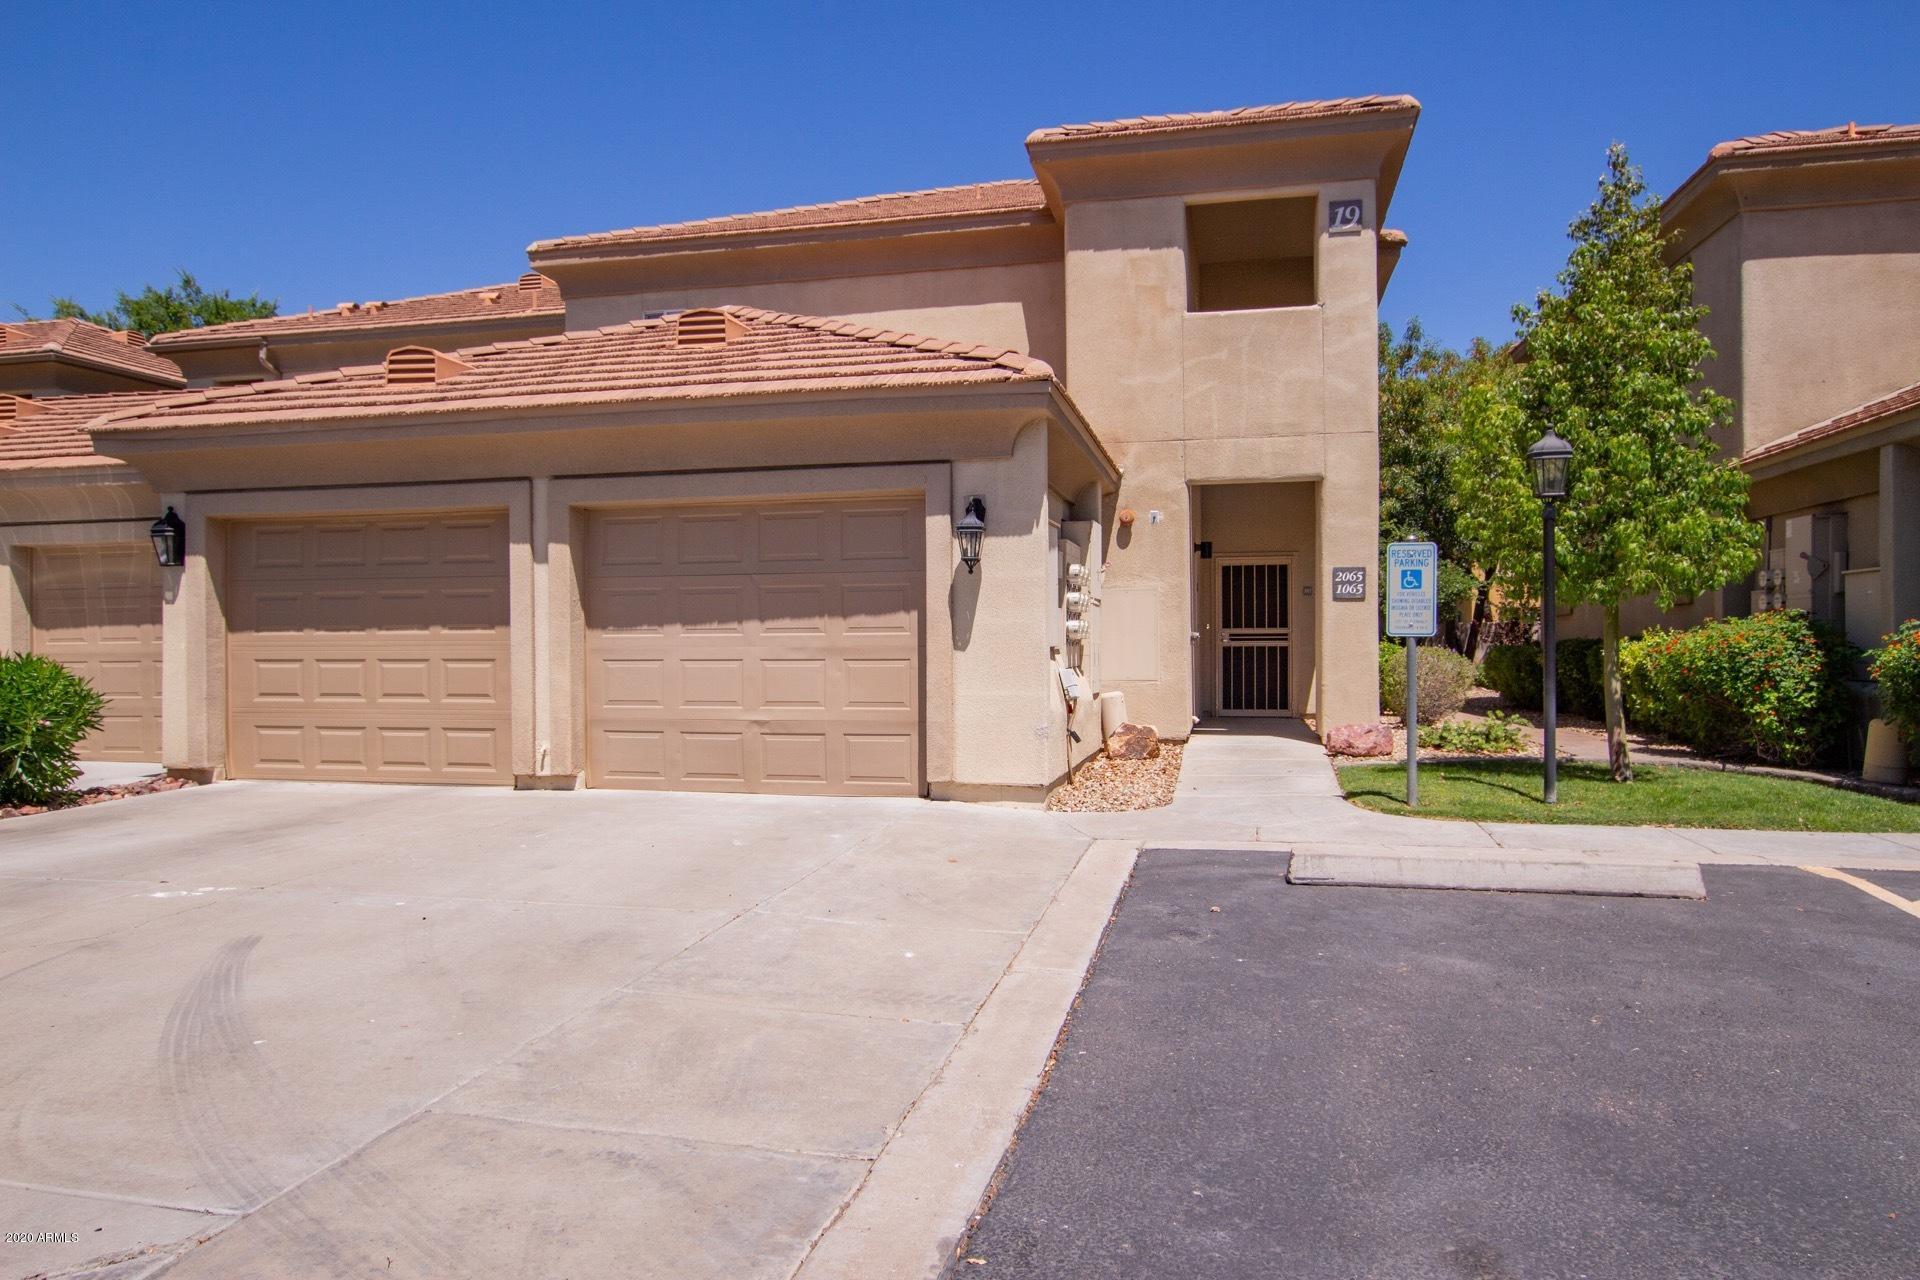 Photo of 7401 W ARROWHEAD CLUBHOUSE Drive #2065, Glendale, AZ 85308